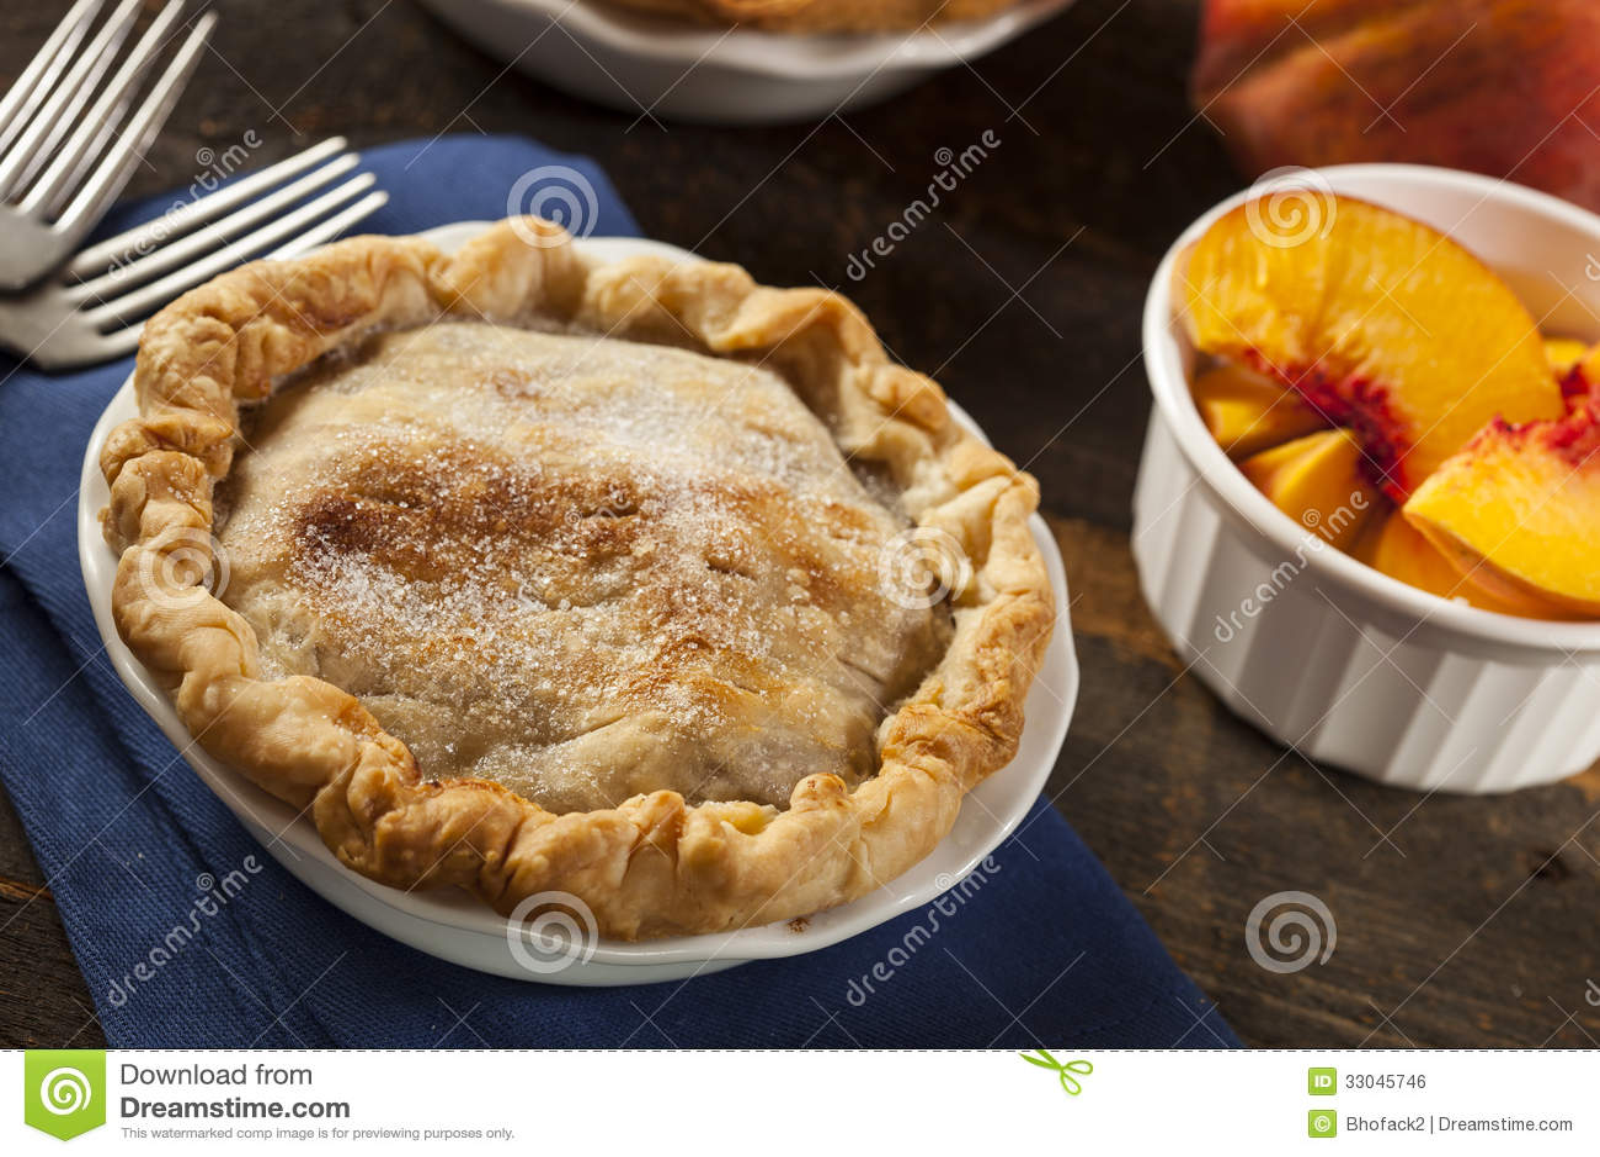 Mini Peach Pie Dessert